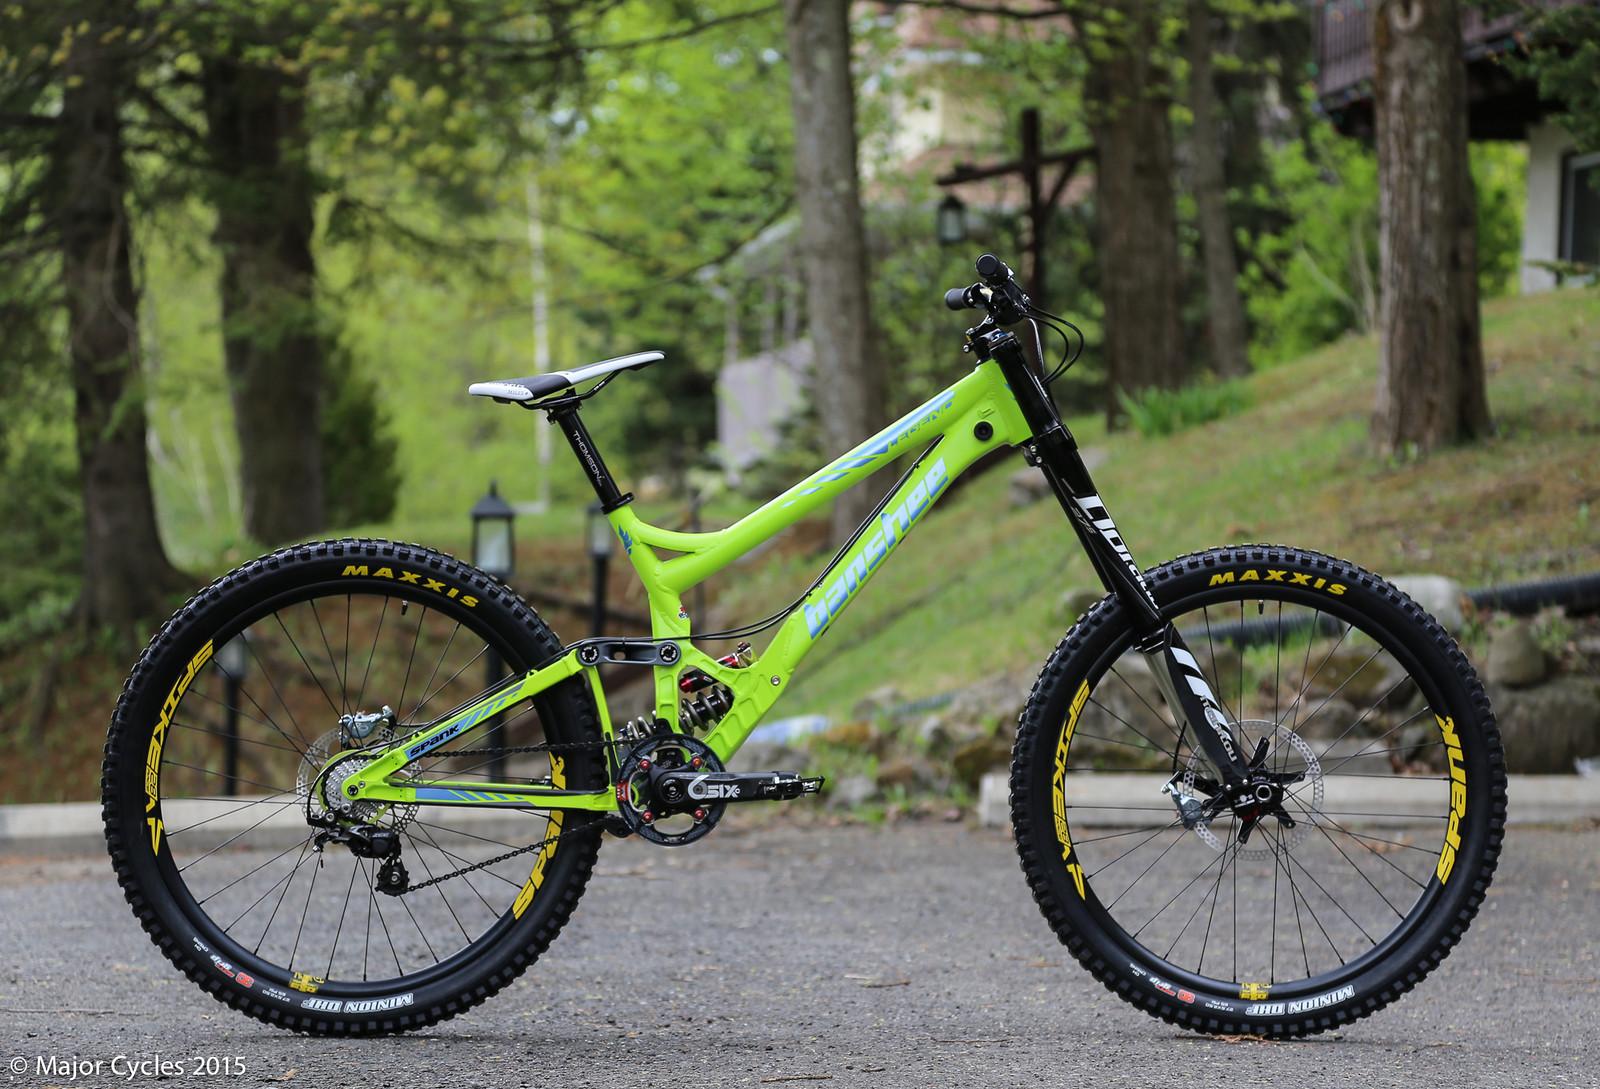 2015 Banshee/Major Cycles' 650B Legend Prototype